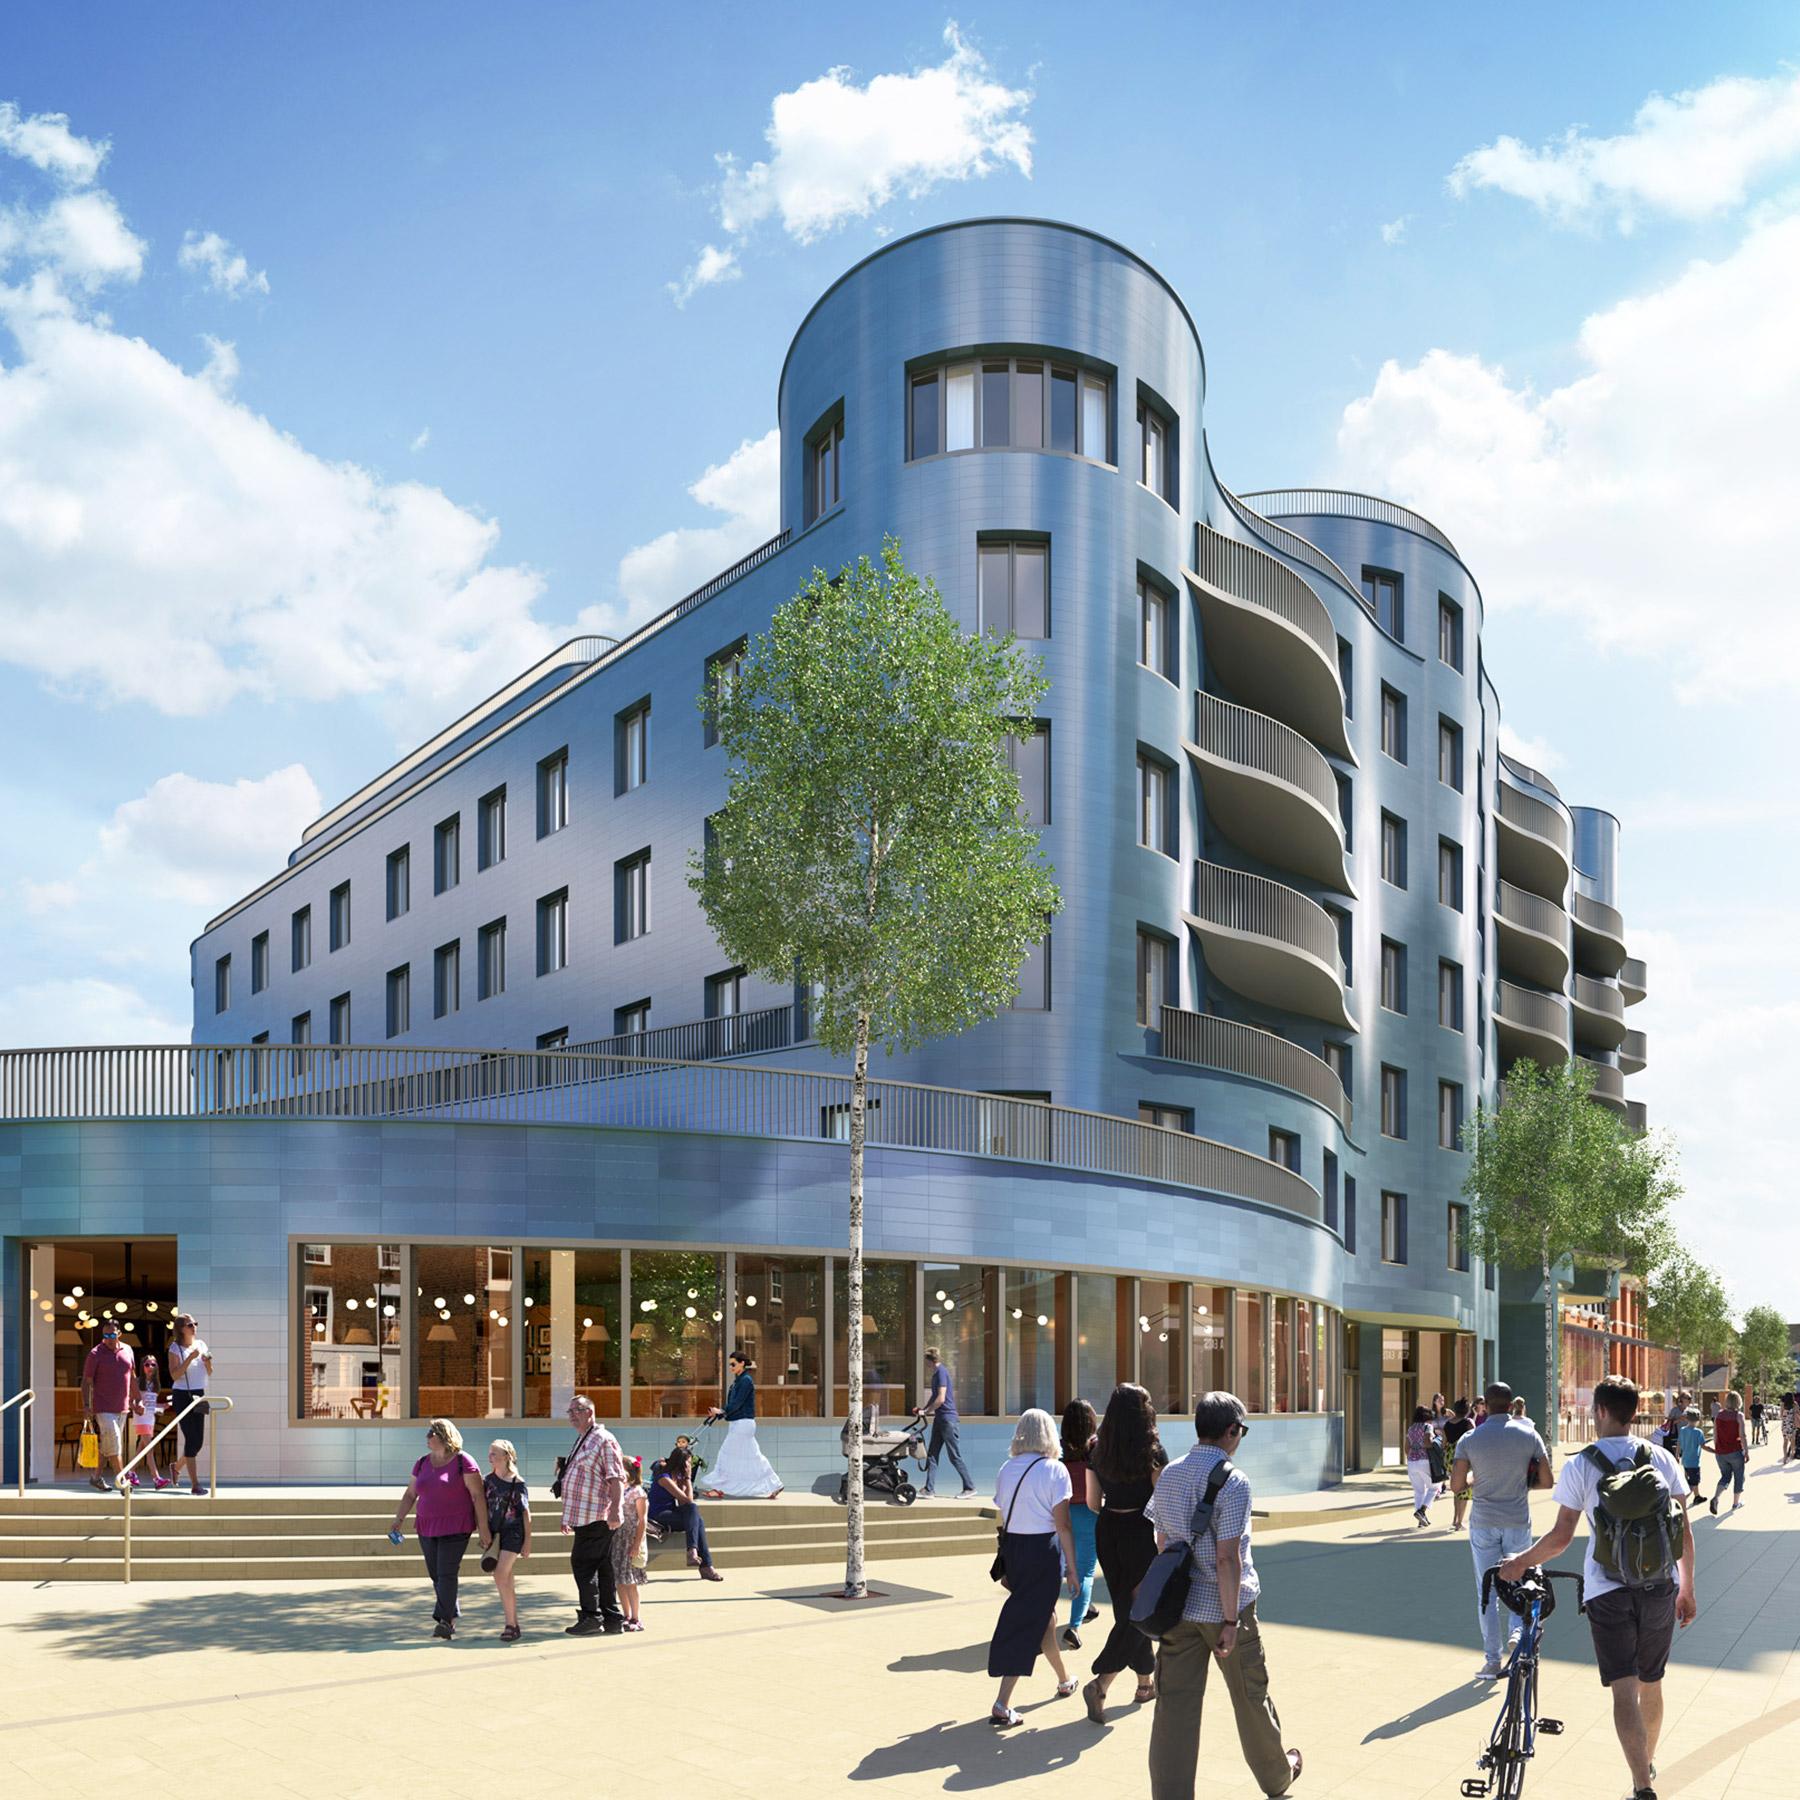 Cheap Apartments Near Journal Square: Almeida, Islington Square